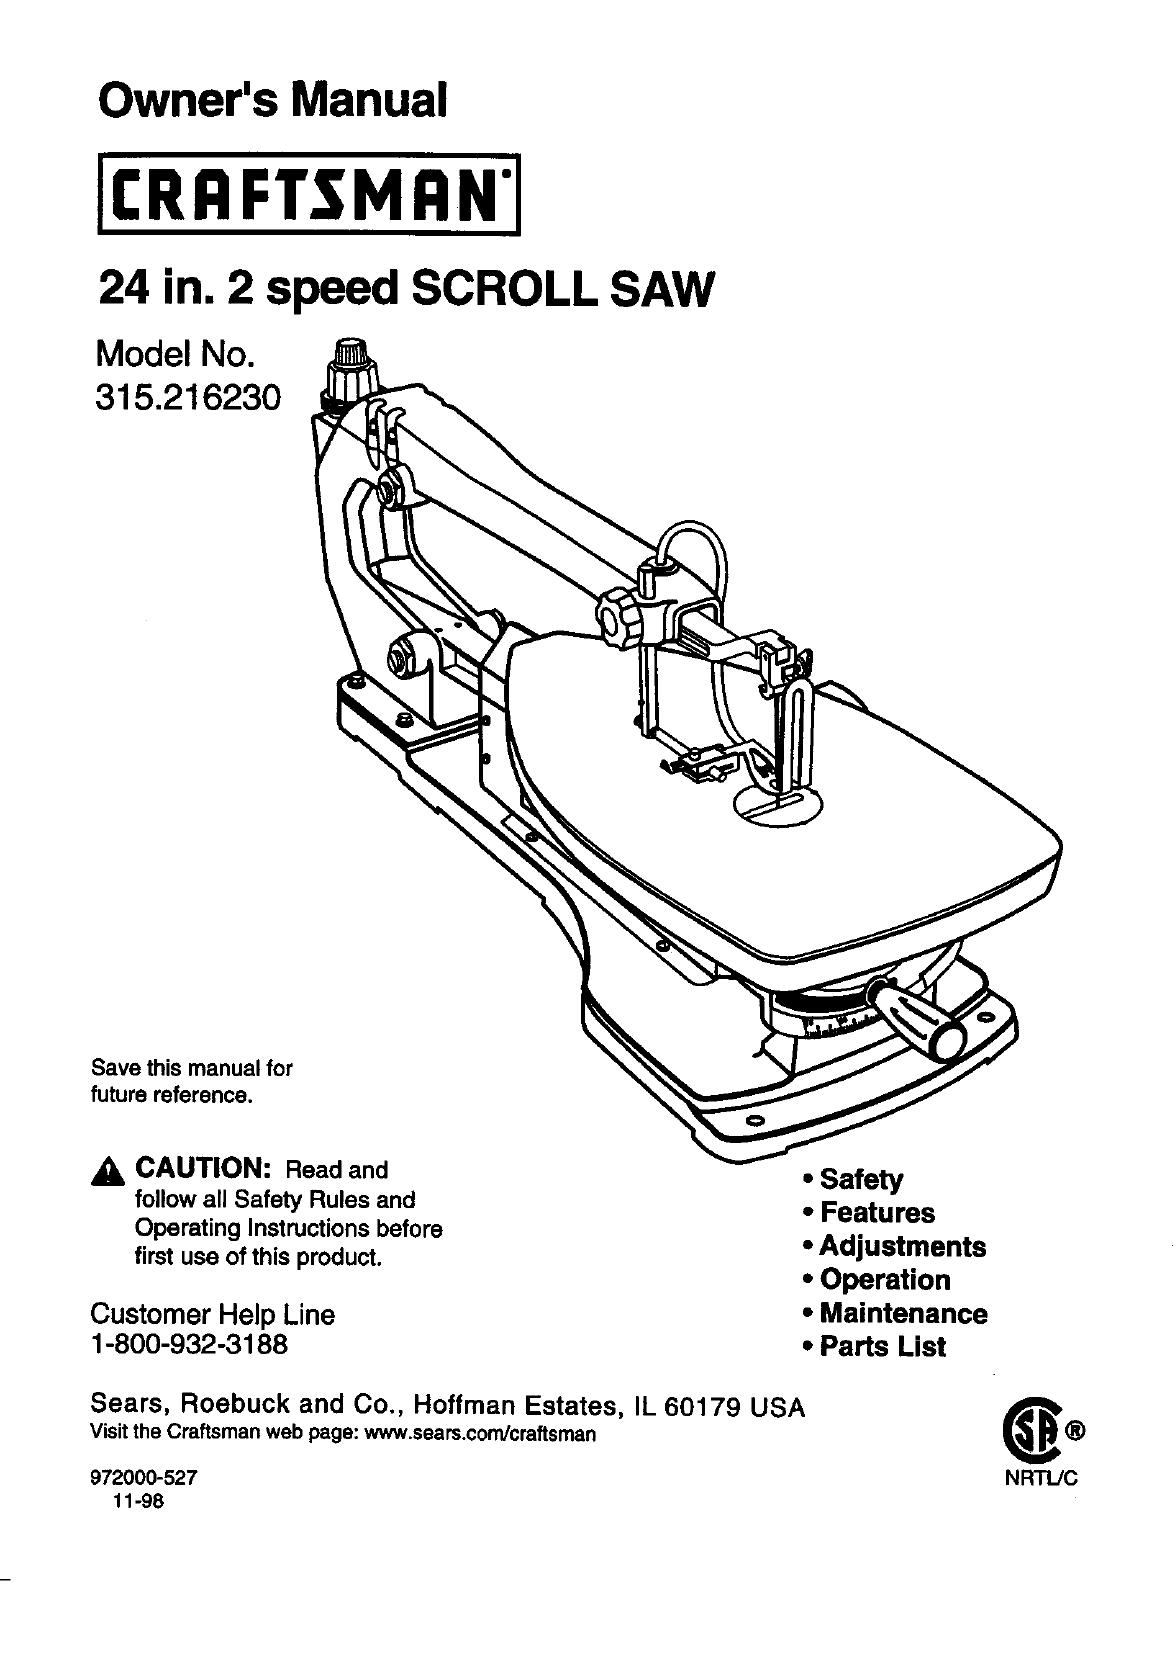 Craftsman 315216230 User Manual 24 IN. 2 SPEED SCROLL SAW